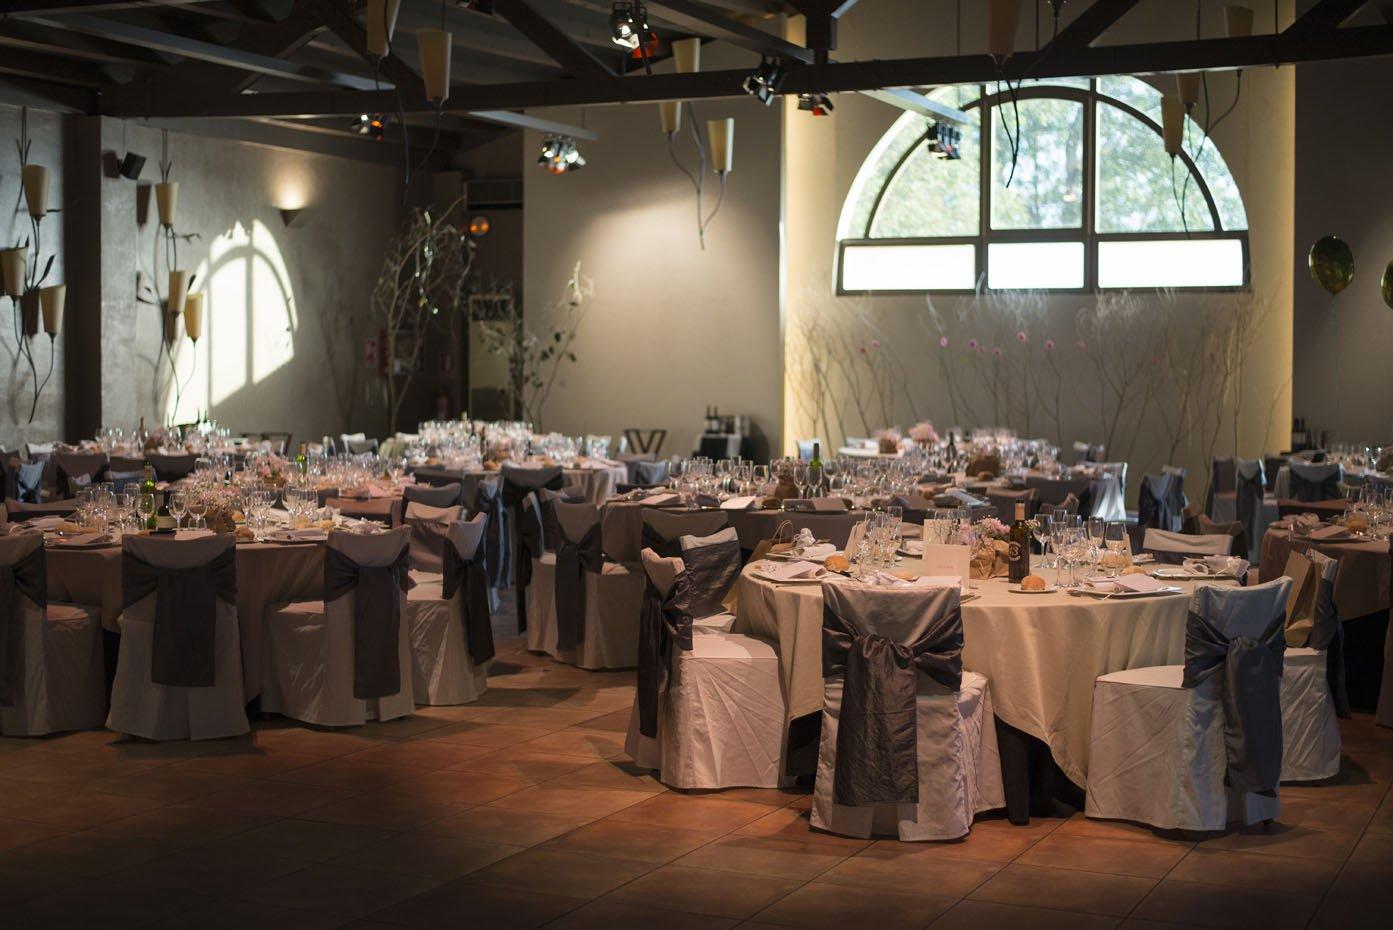 Casament-can-macia-espai-gastronomia3